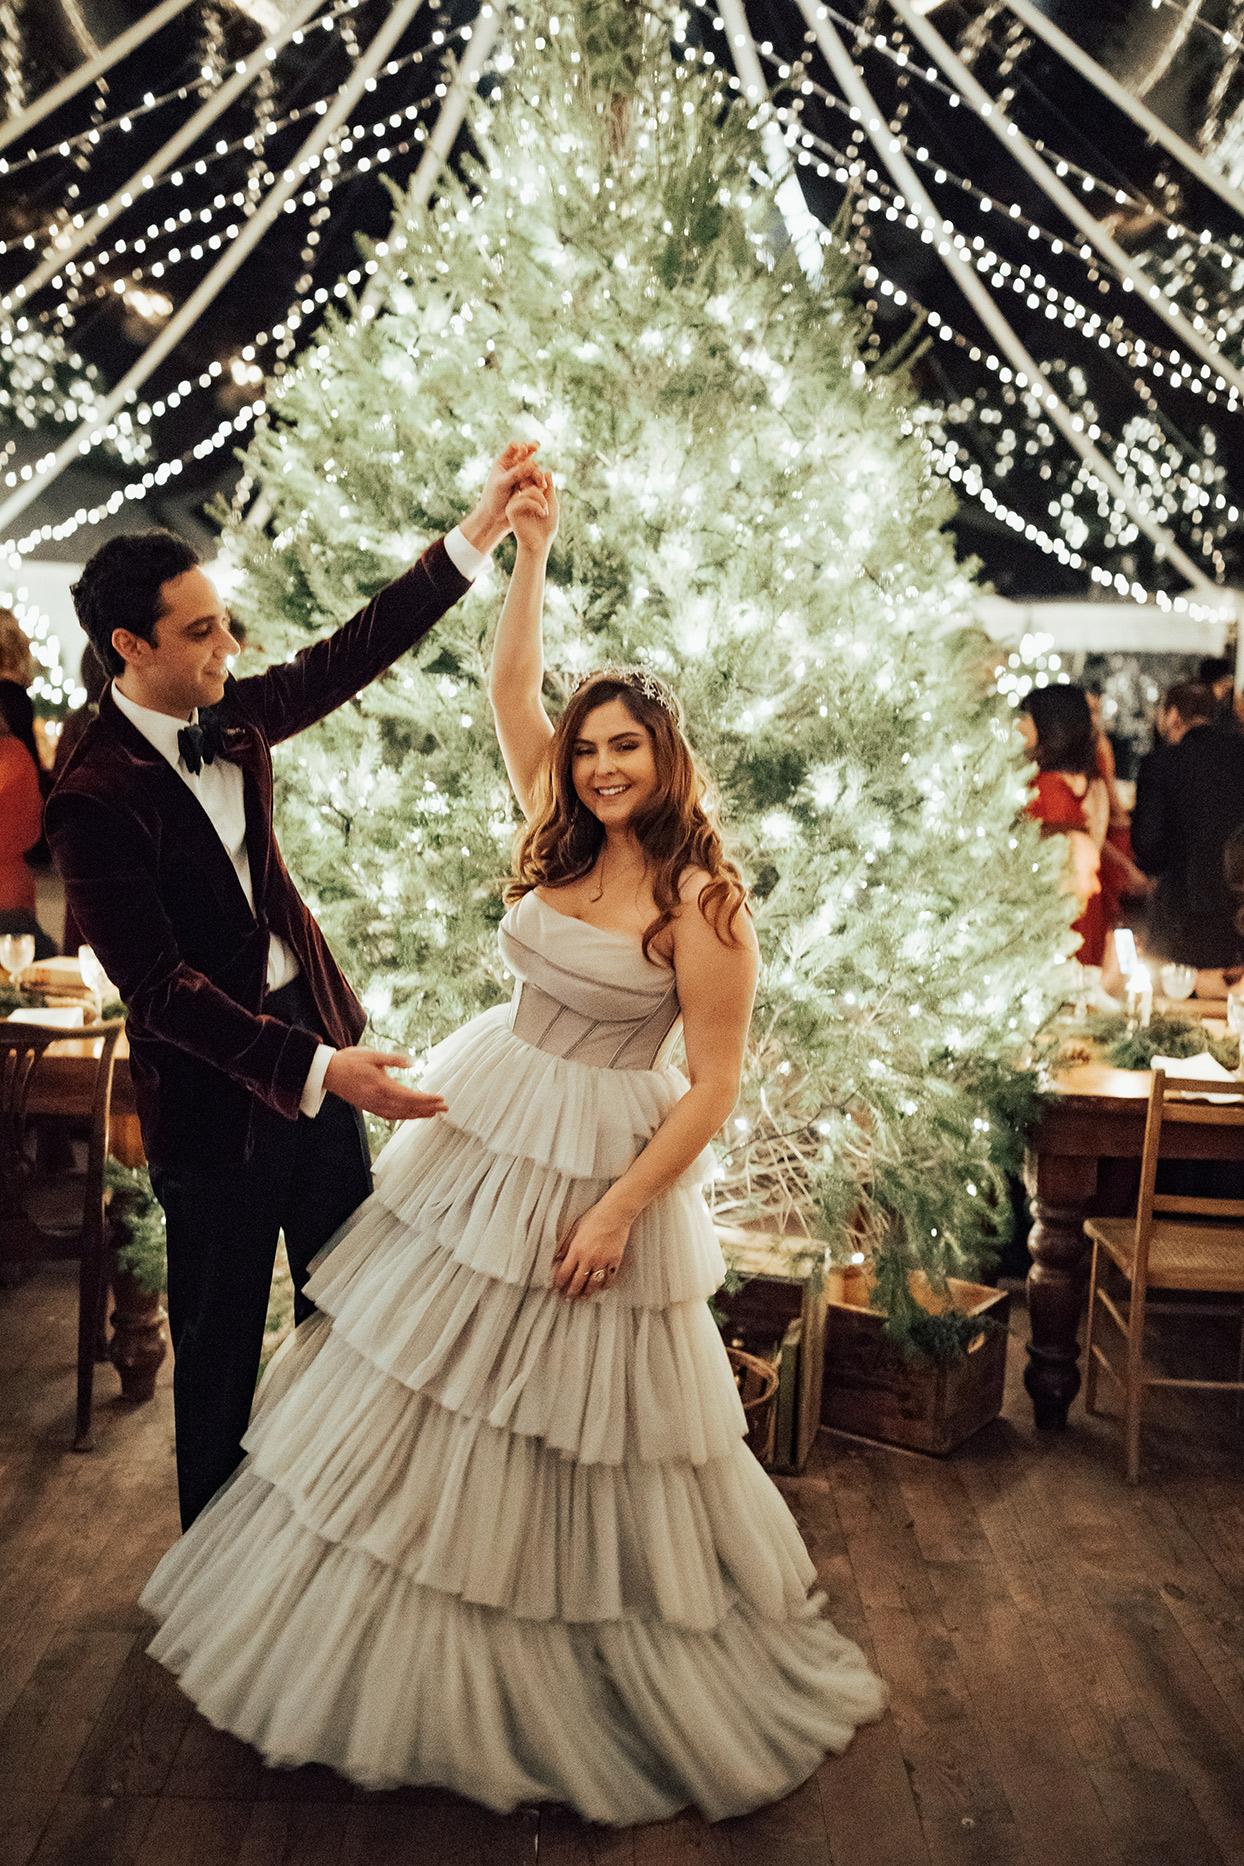 noelle danny wedding reception bride and groom dancing